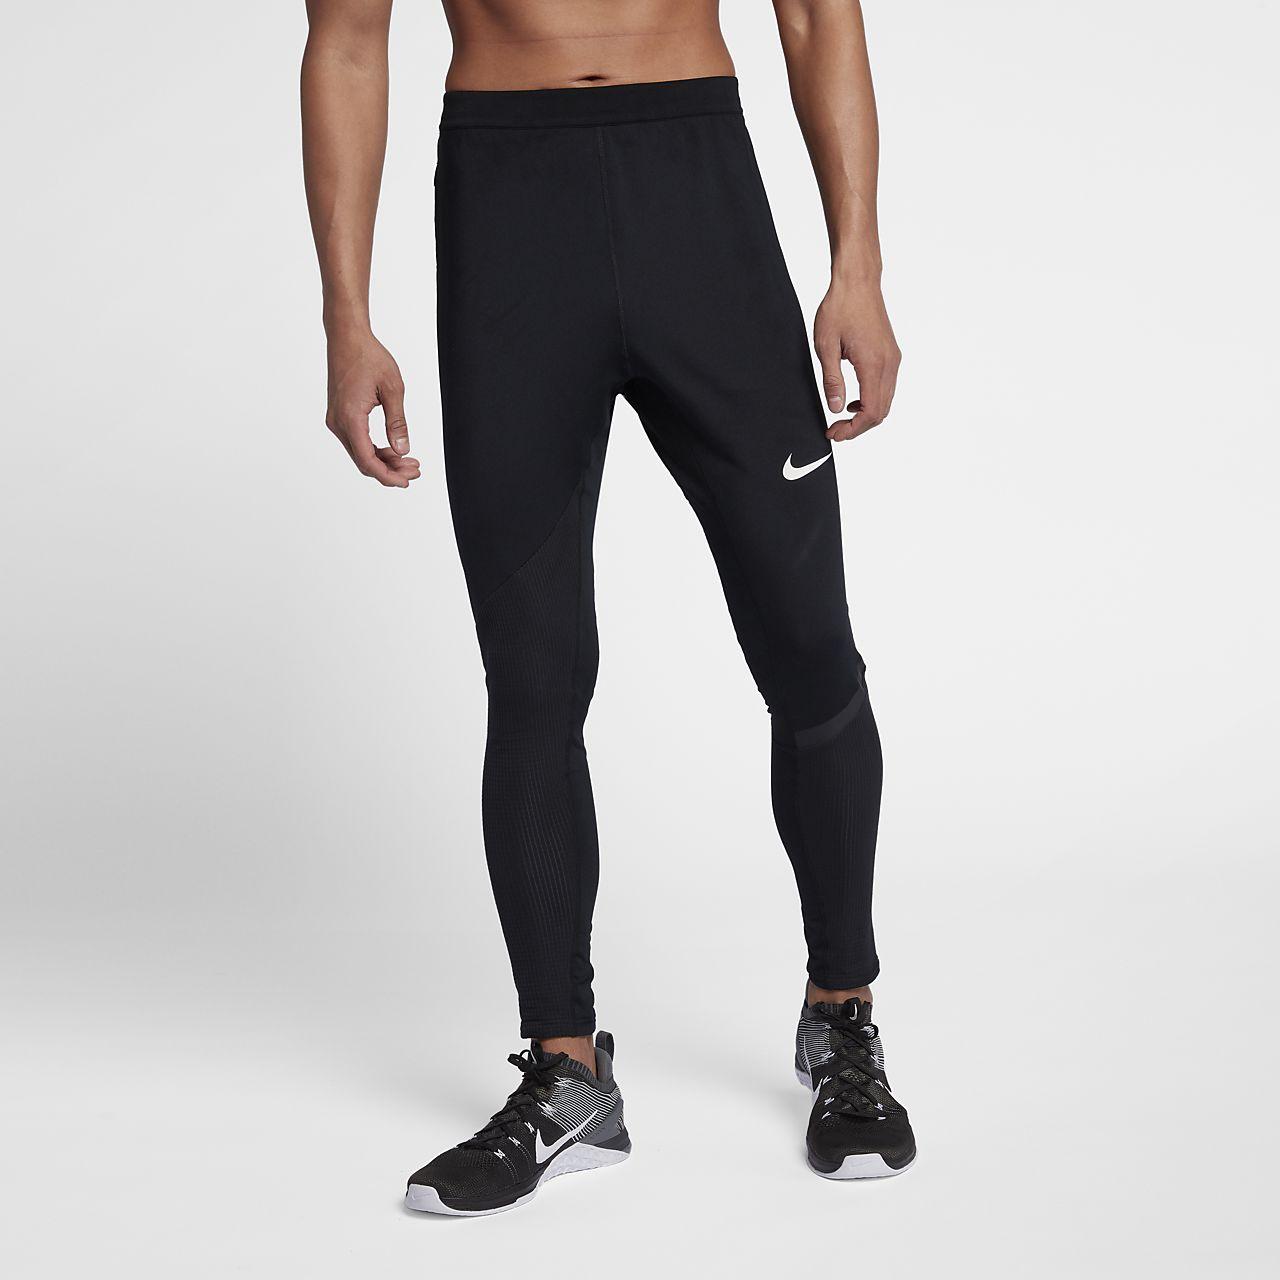 Nike Pro Modern Herren-Tights